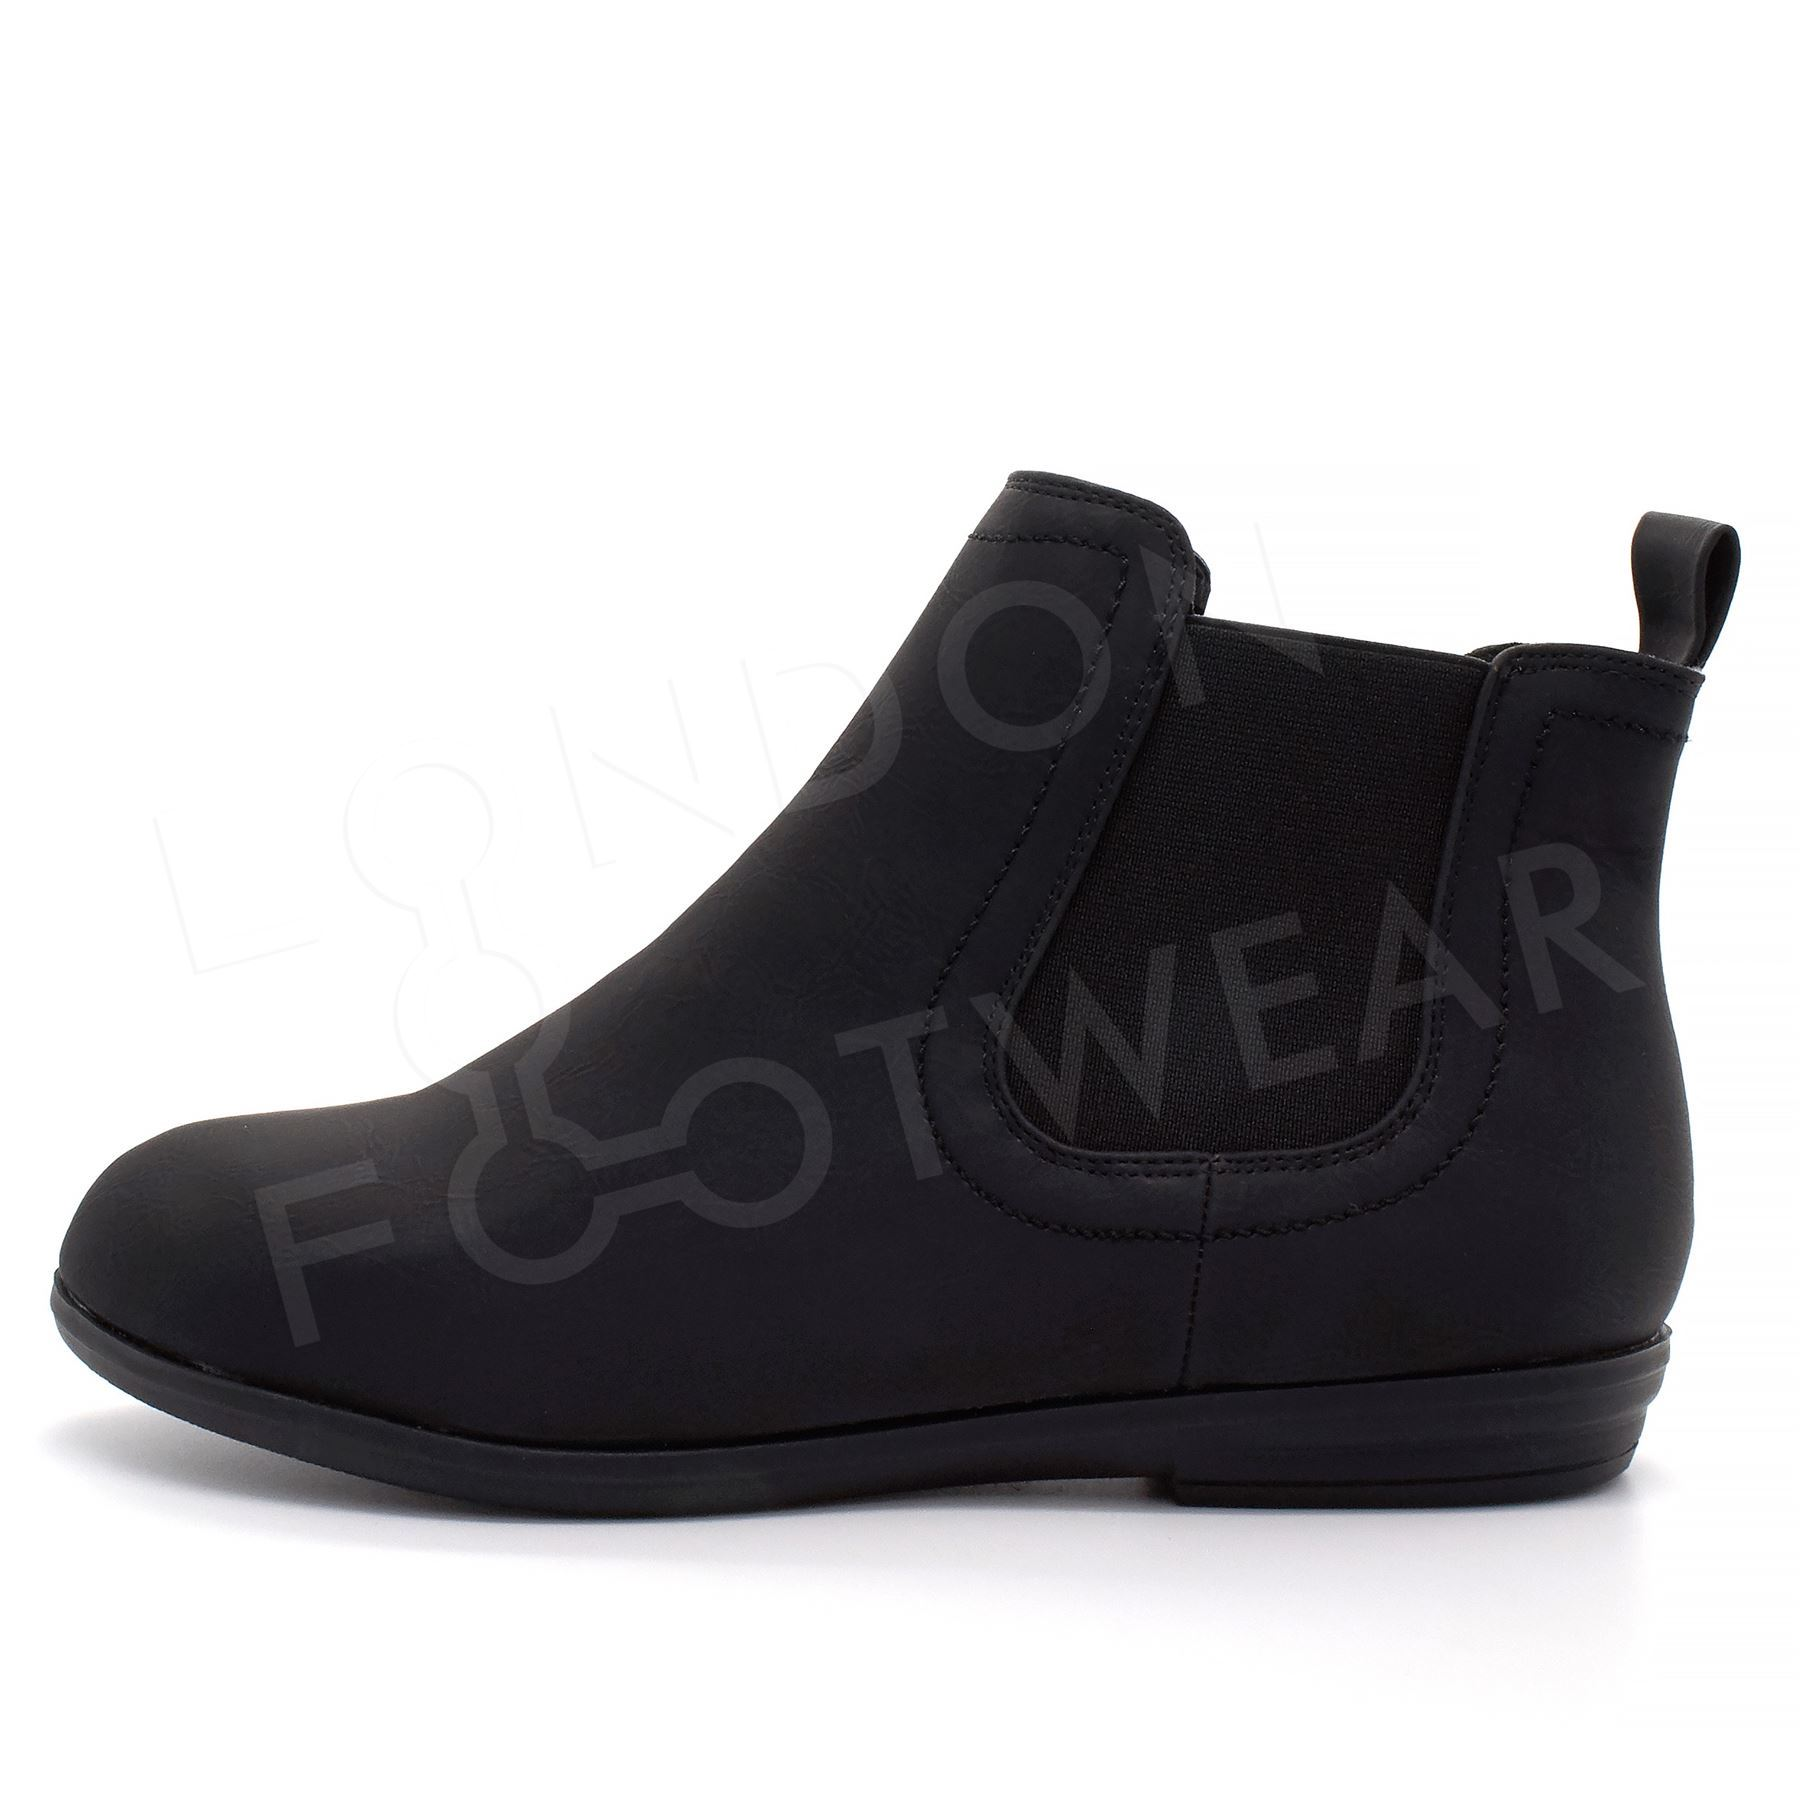 new womens flat low heel chelsea boots classic